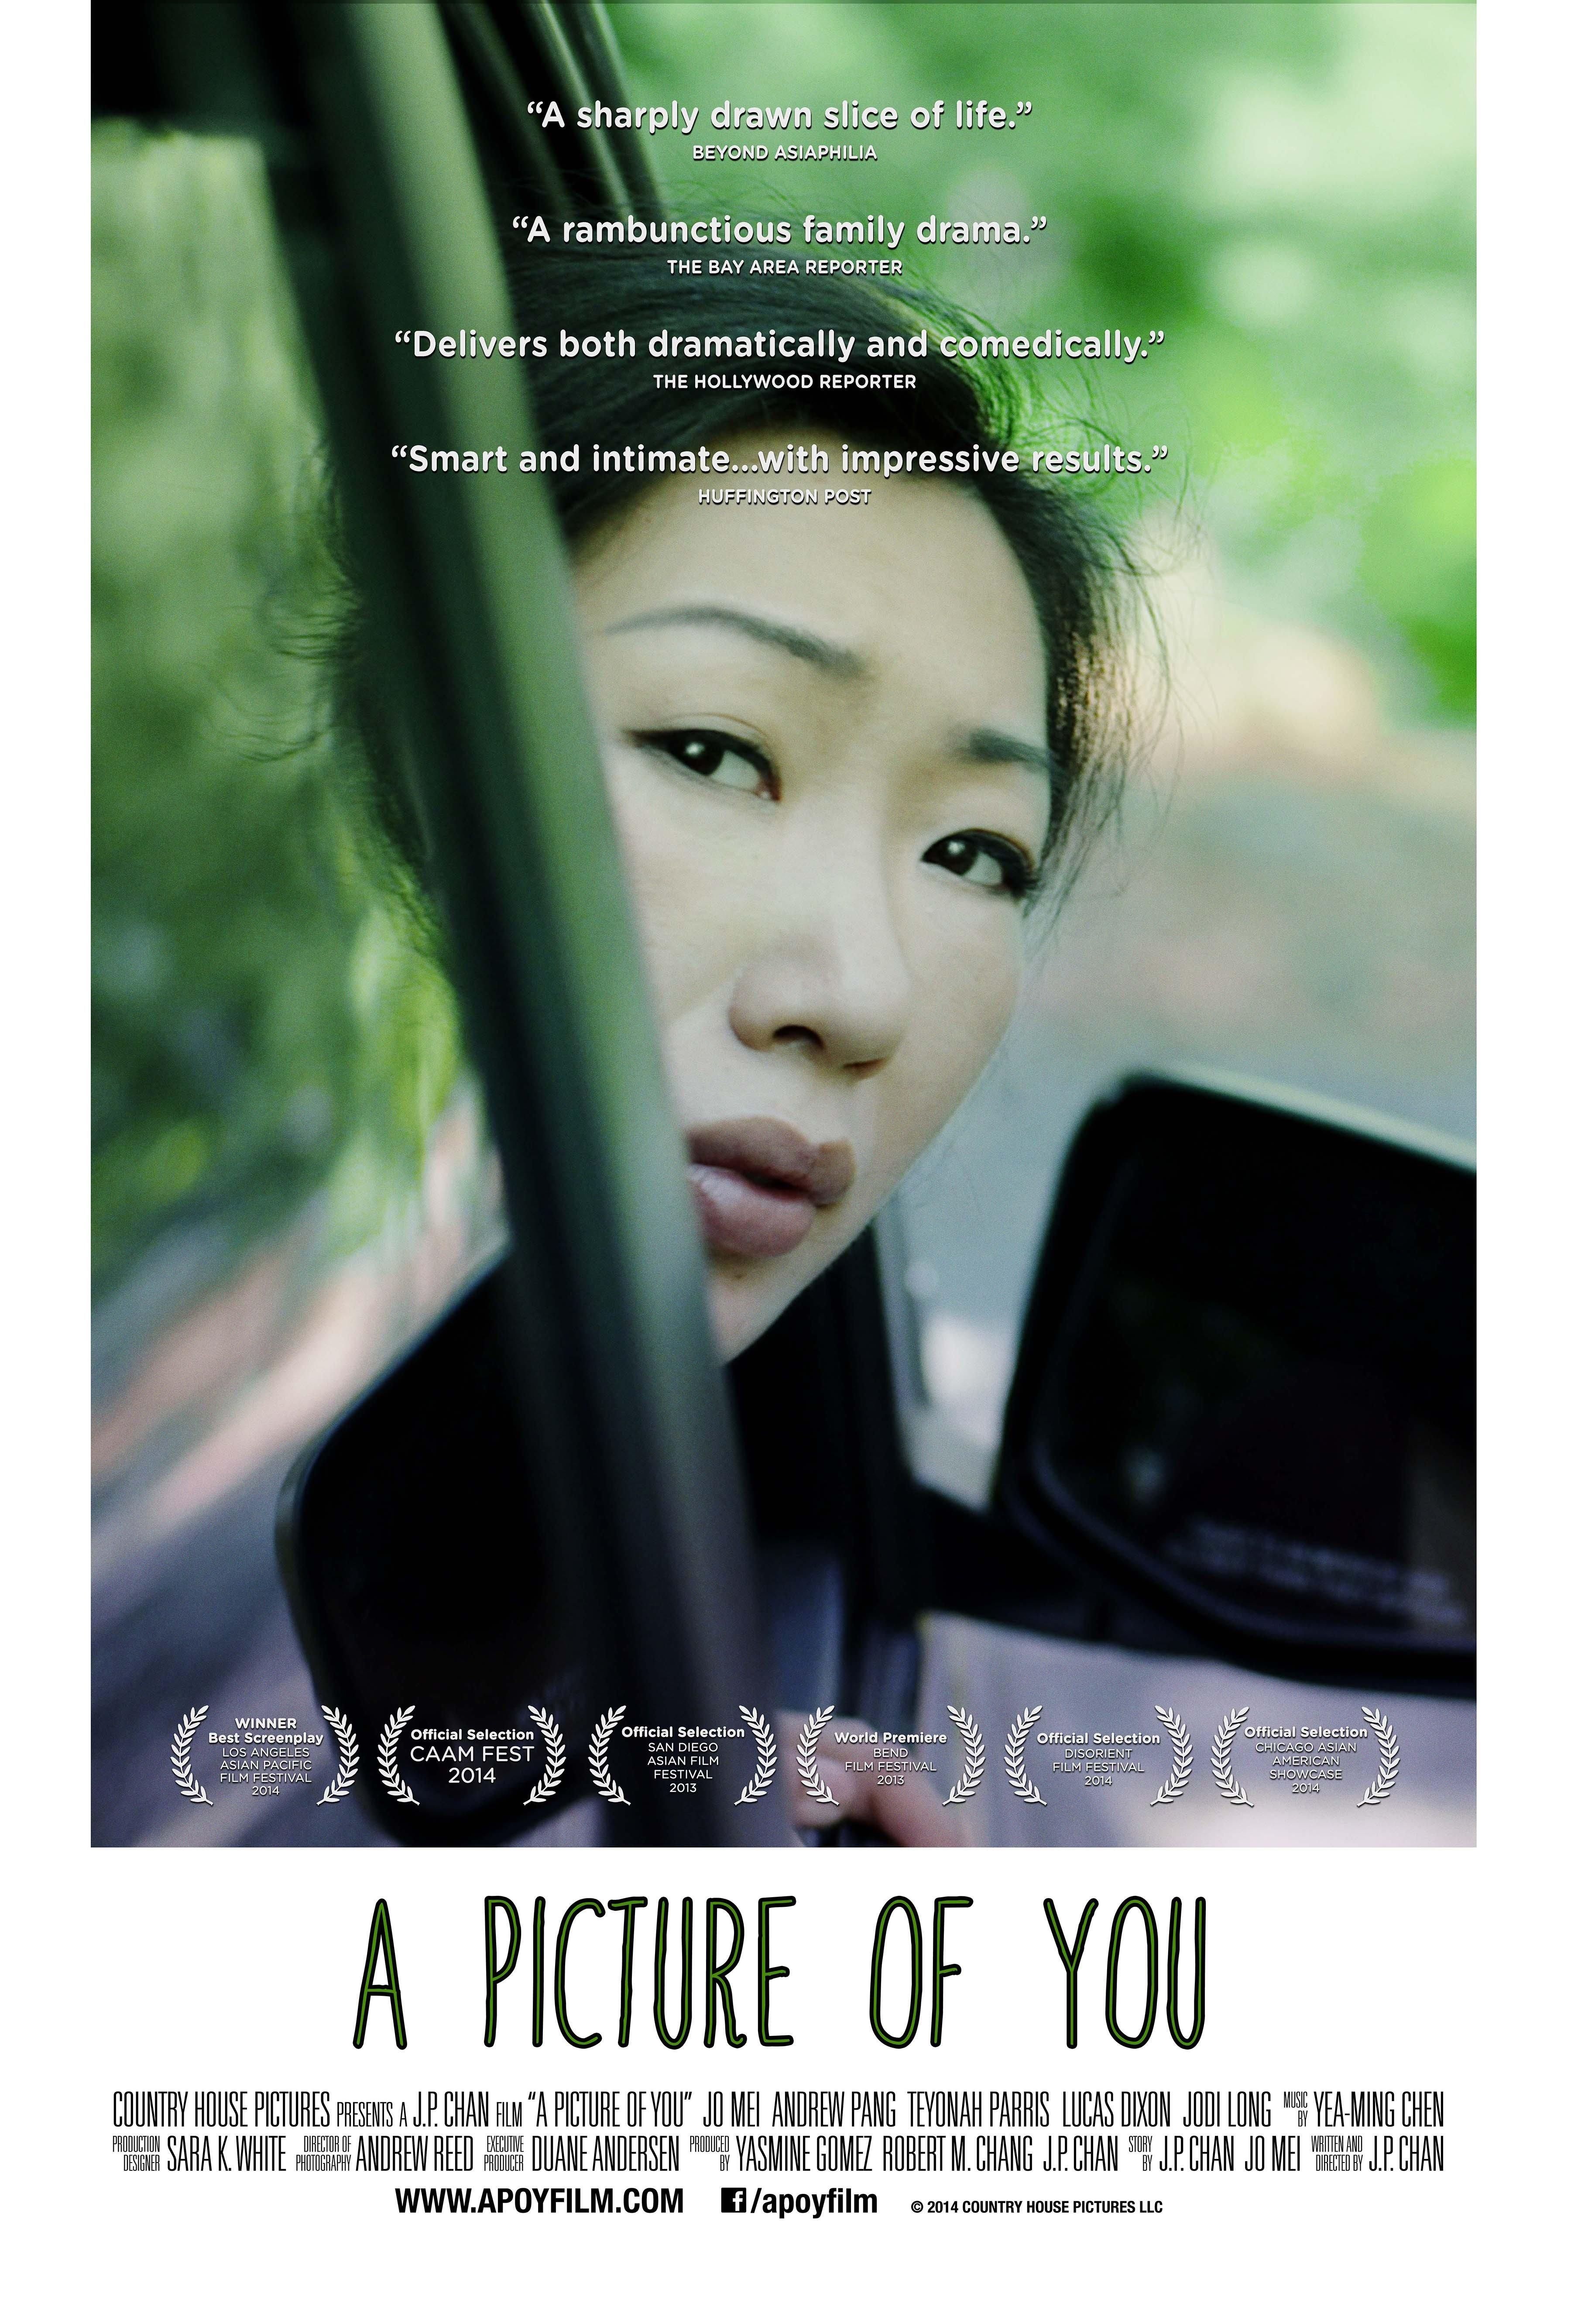 Chicago asian american film festival